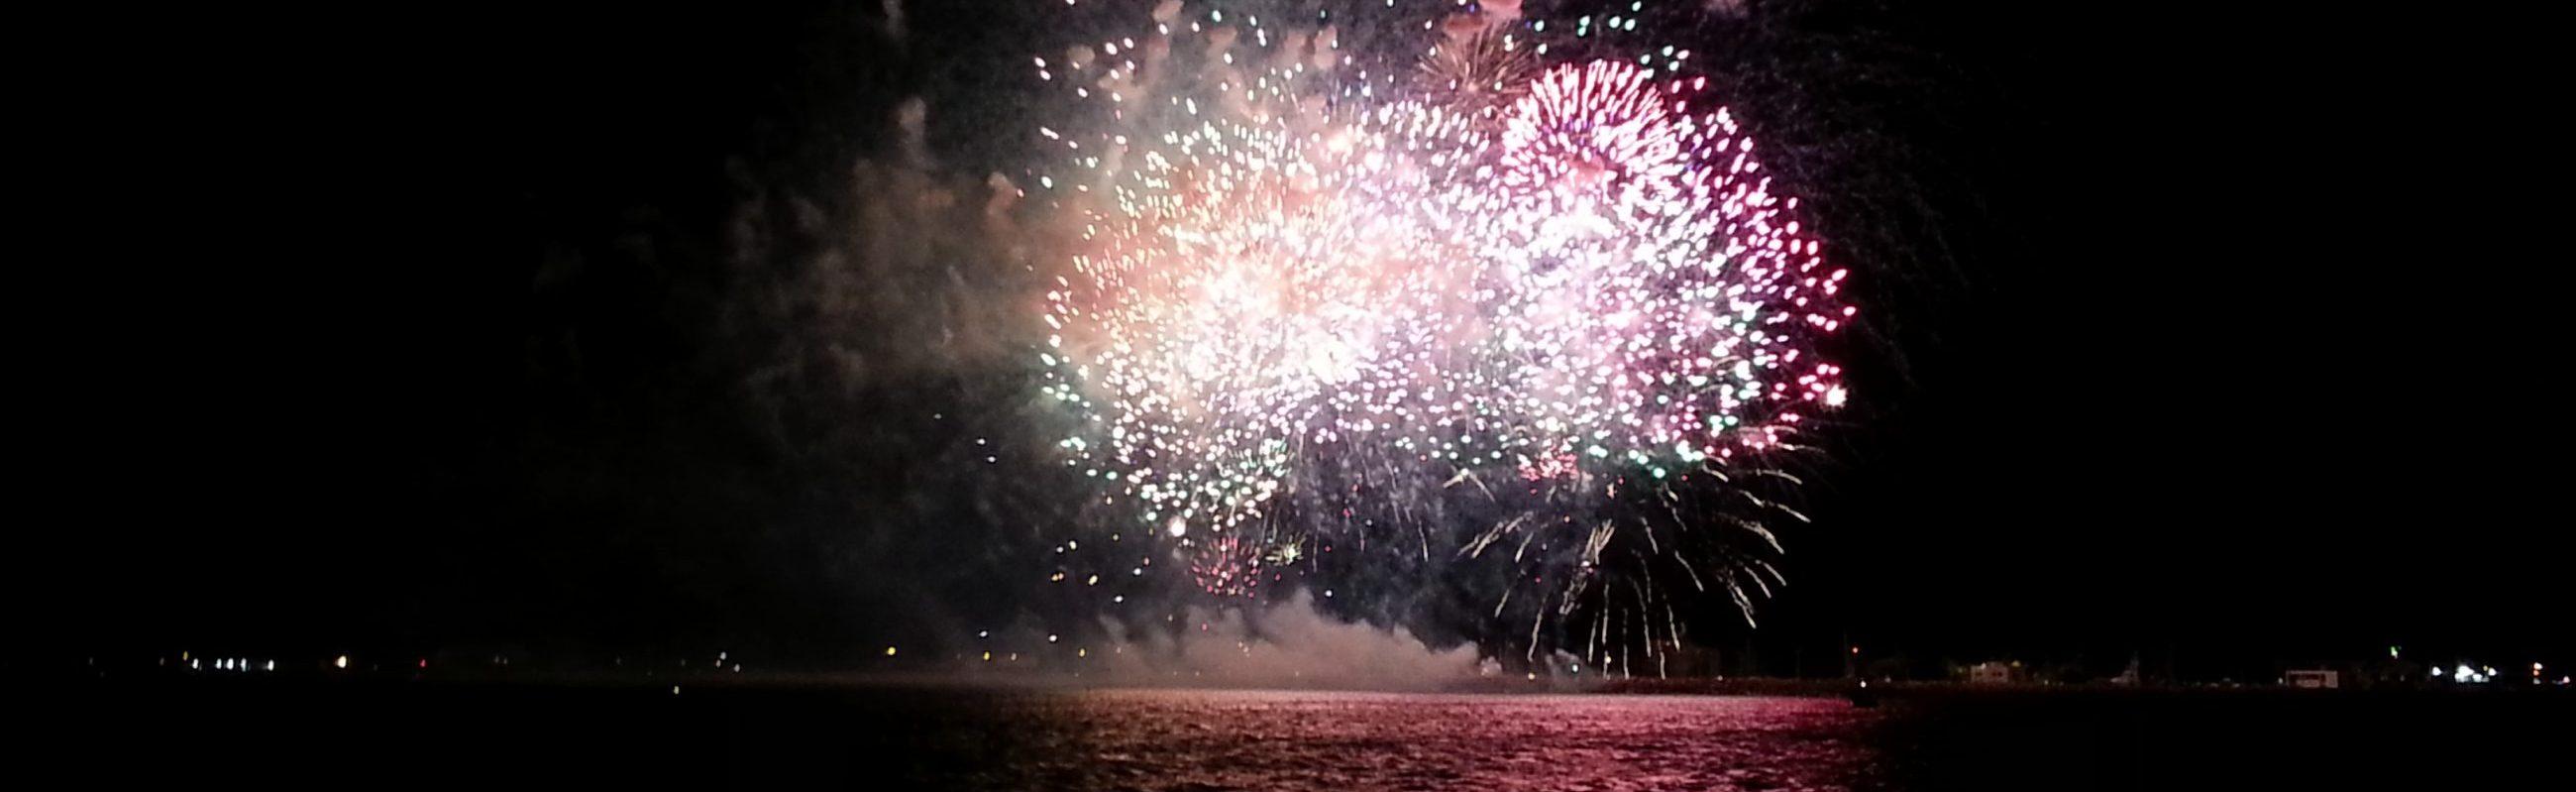 bon cadeau feu d artifice du 14 juillet de sainte la mer navivoile